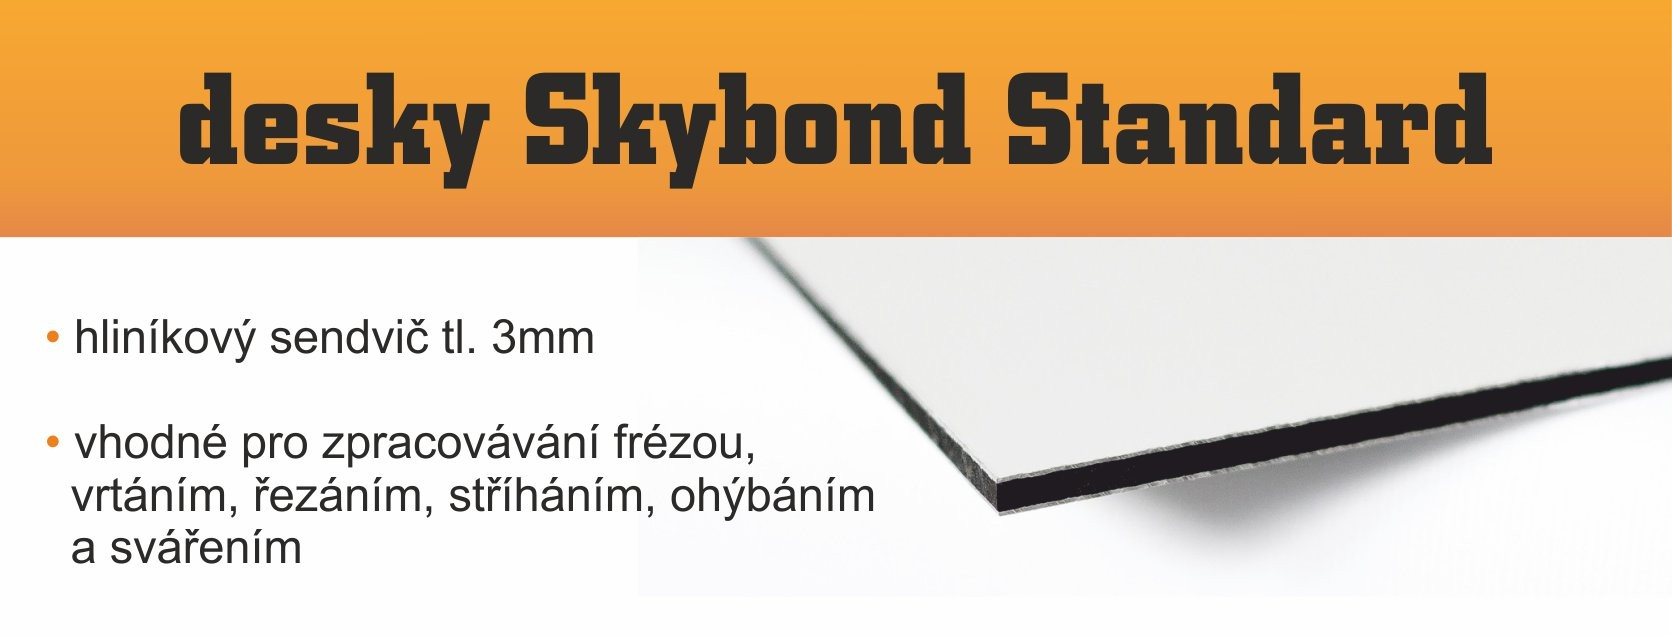 desky Skybond Standard